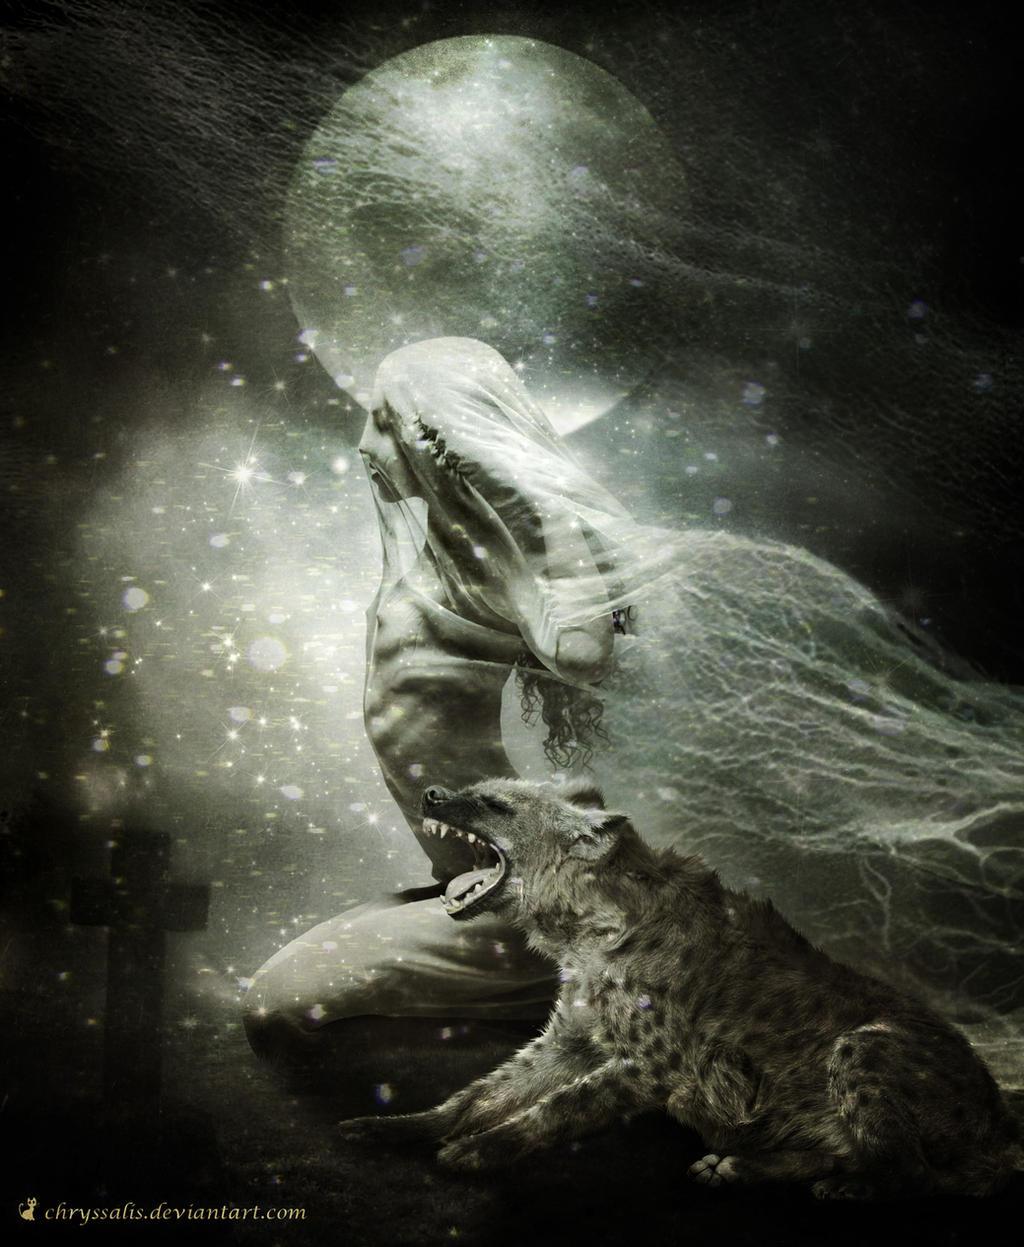 KEEPERS OF MEMORIES.. by chryssalis